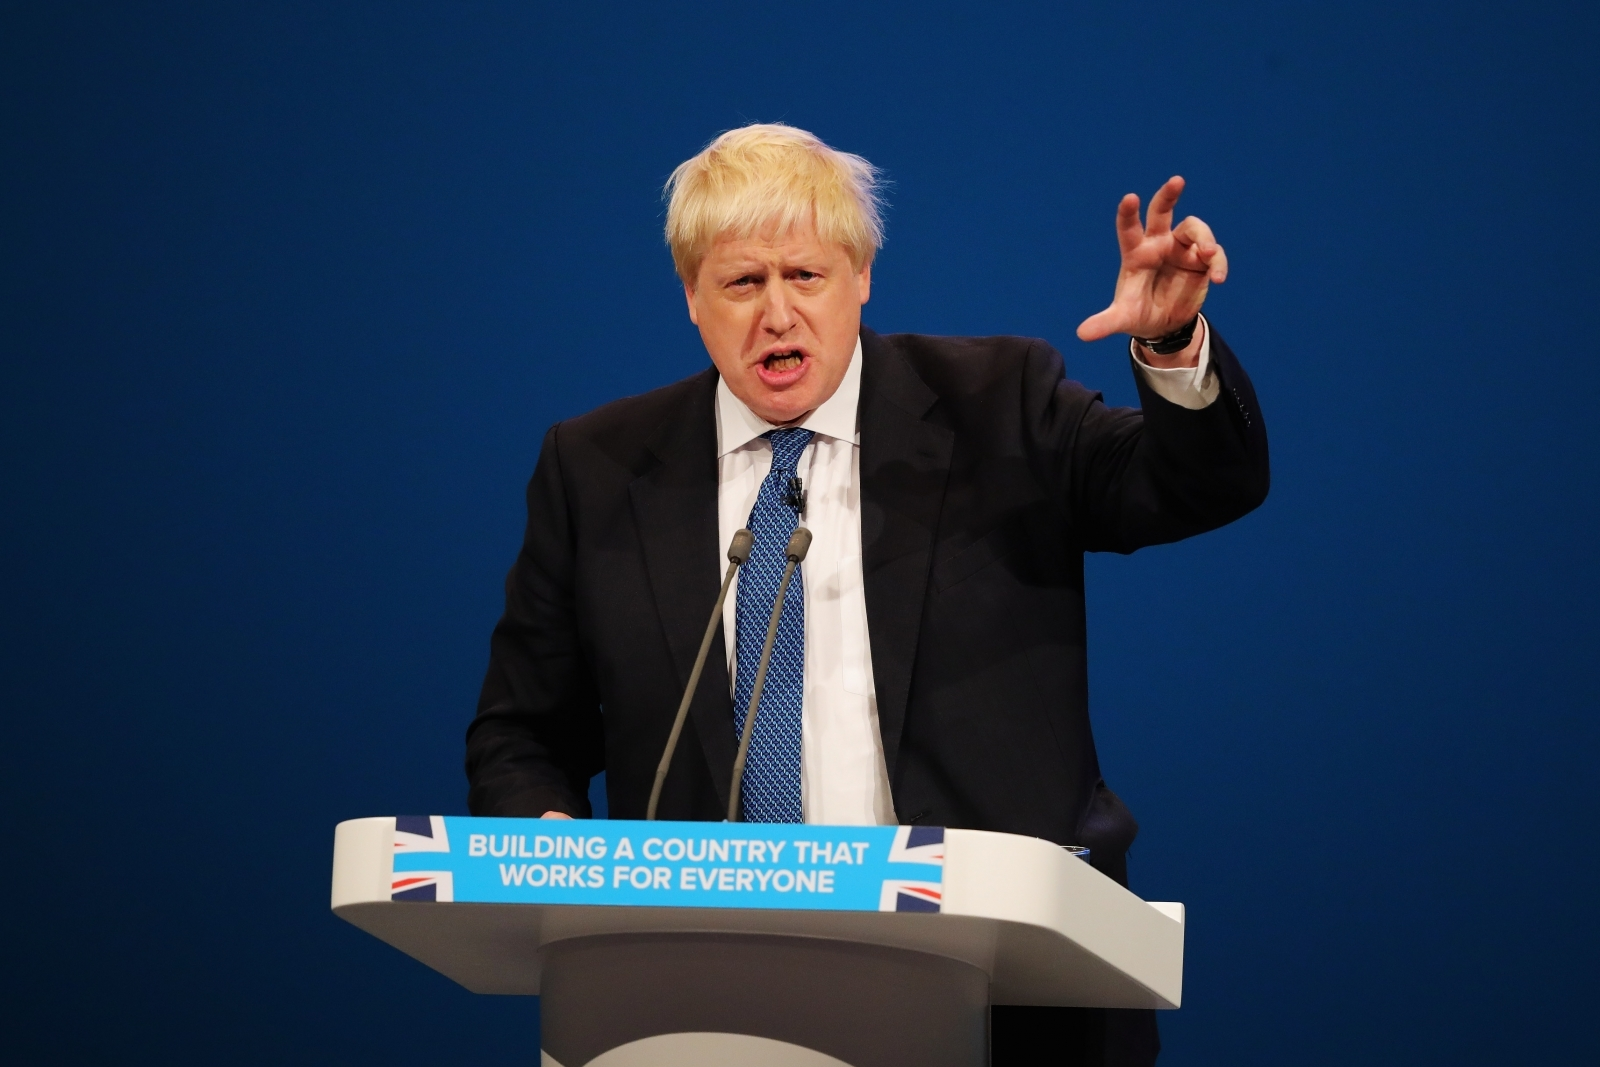 london mayor sadiq khan calls on boris johnson to resign